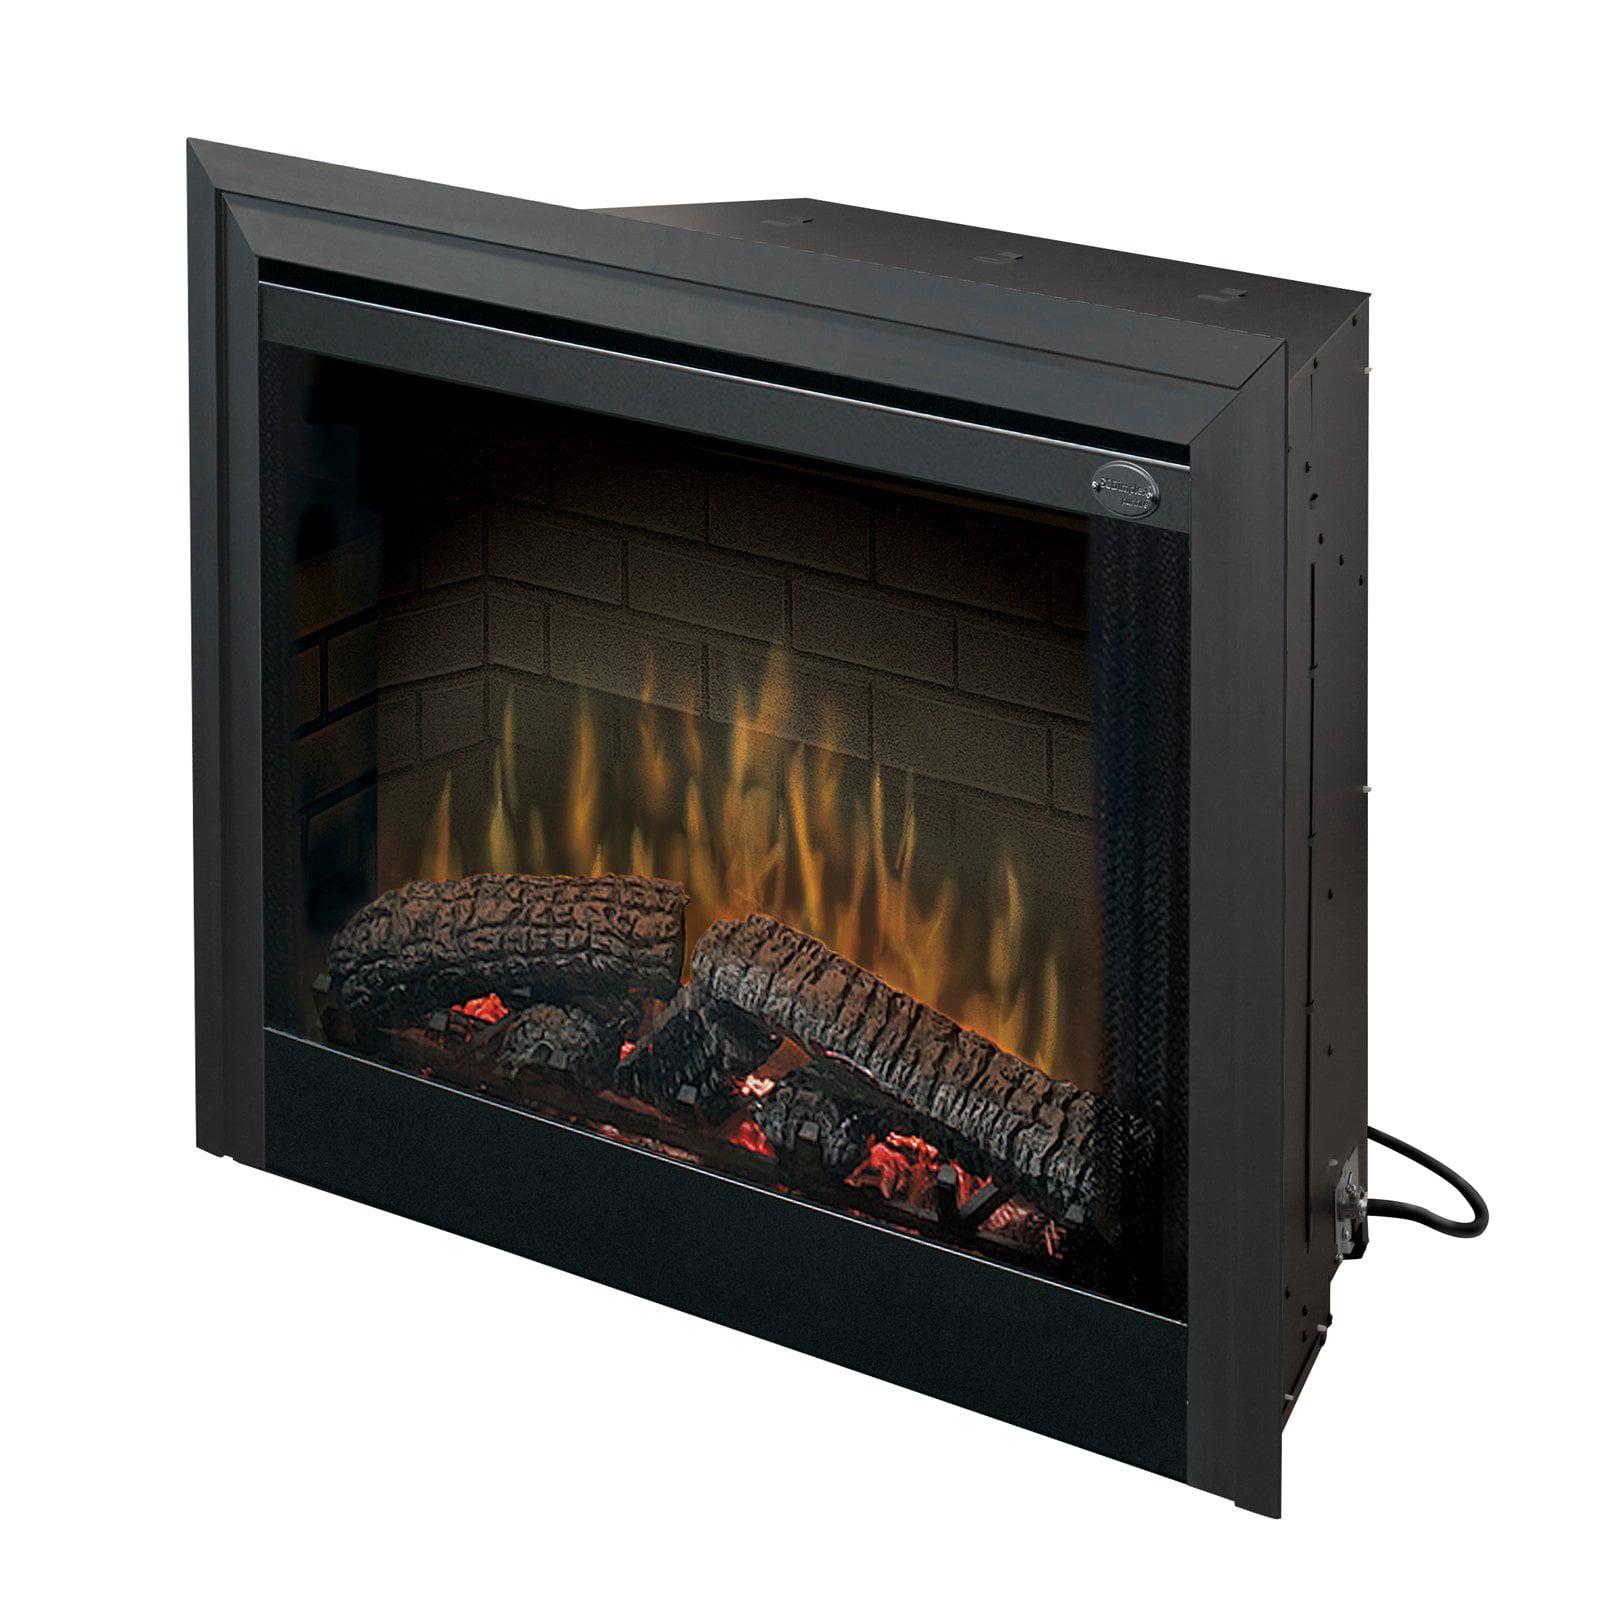 dimplex 39 in standard built in electric fireplace insert walmart com rh walmart com replacement electric fireplace insert ndf 68n replacing electric fireplace insert